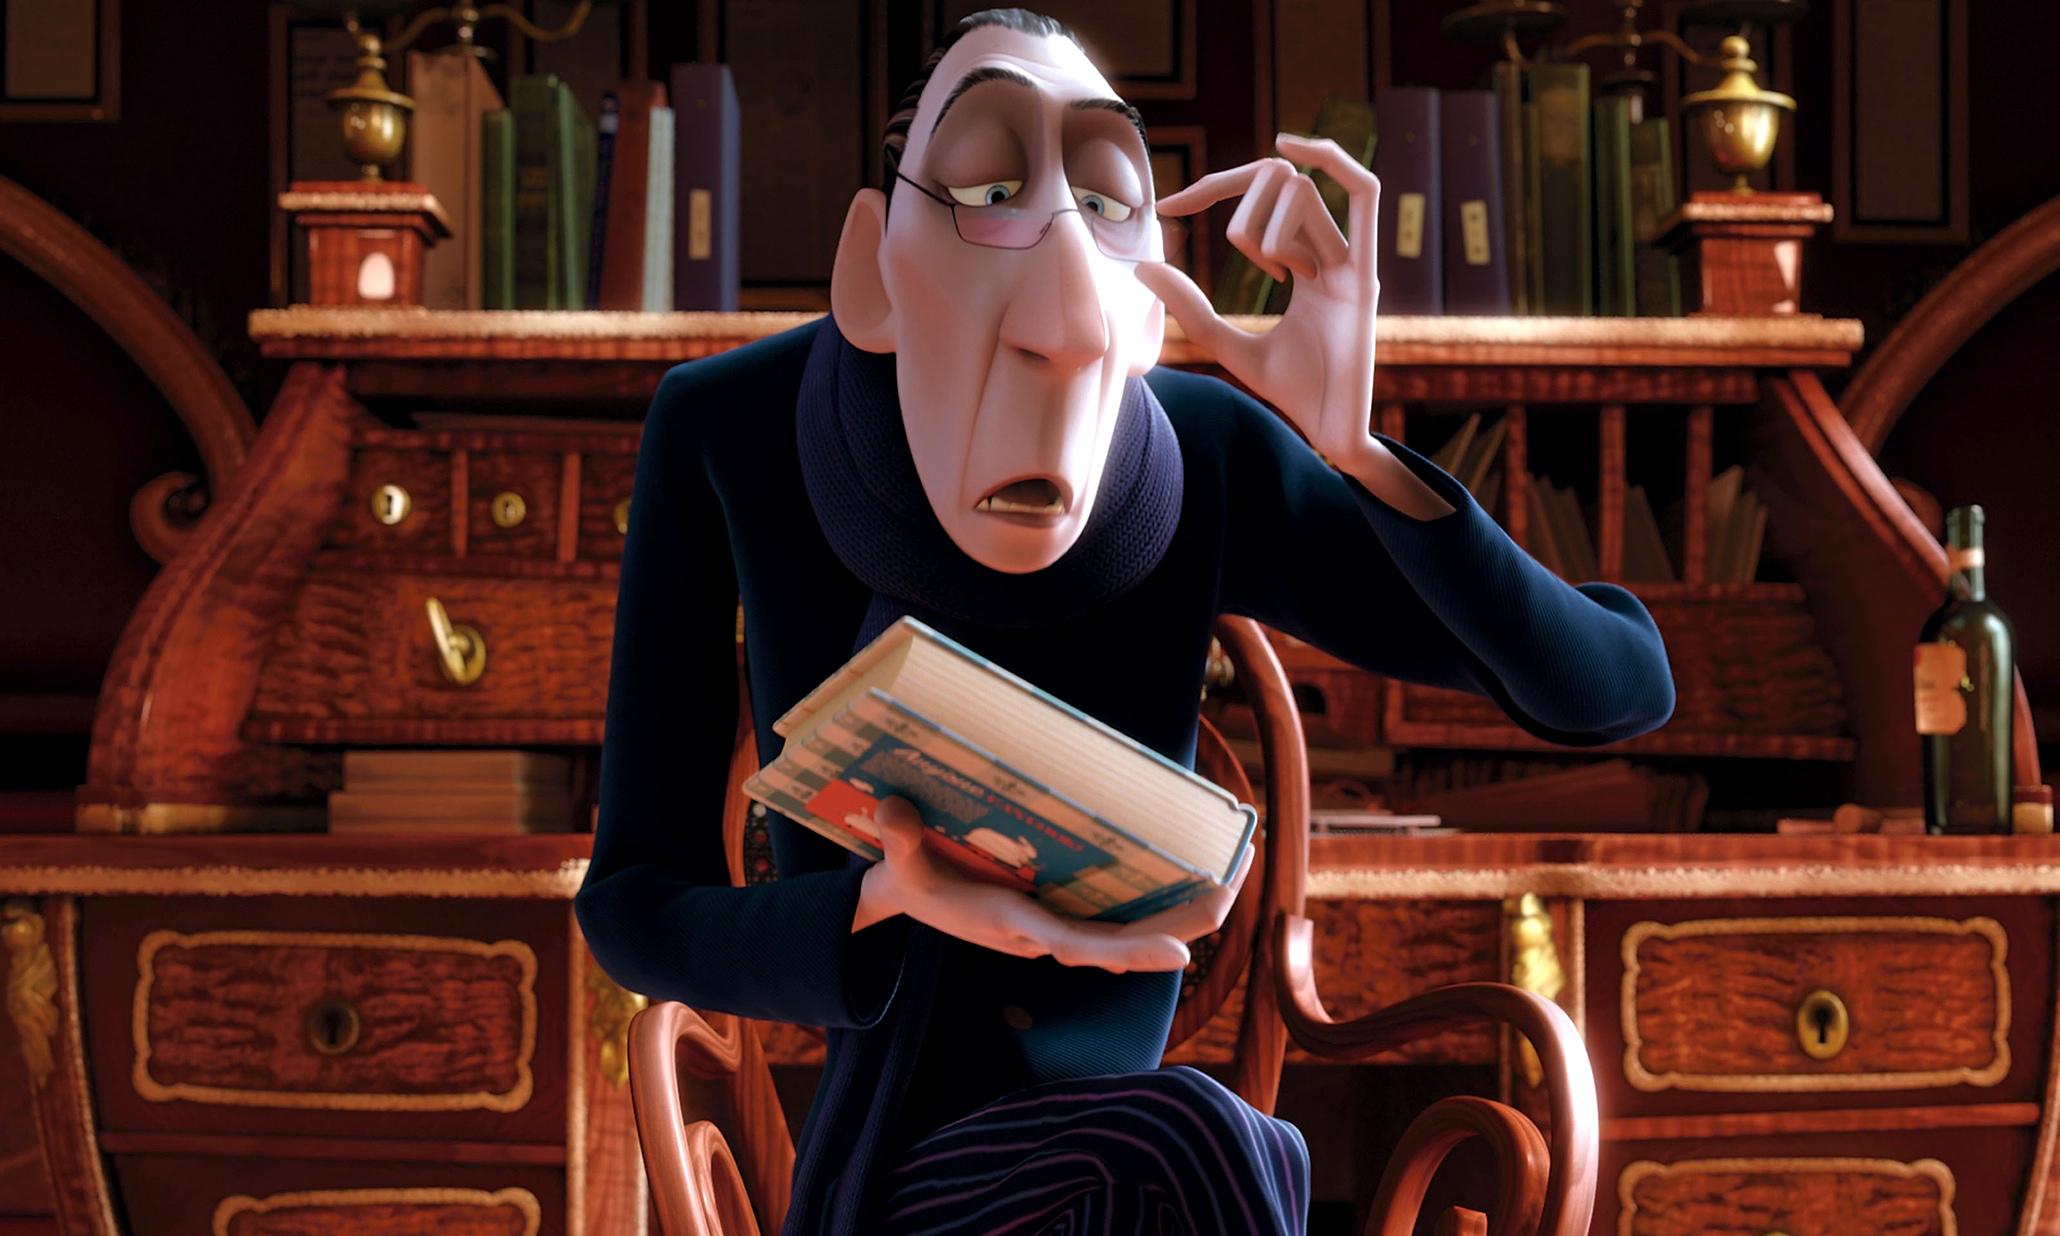 Anton Ego, the critic from Disney's 2007 film, Ratatouille